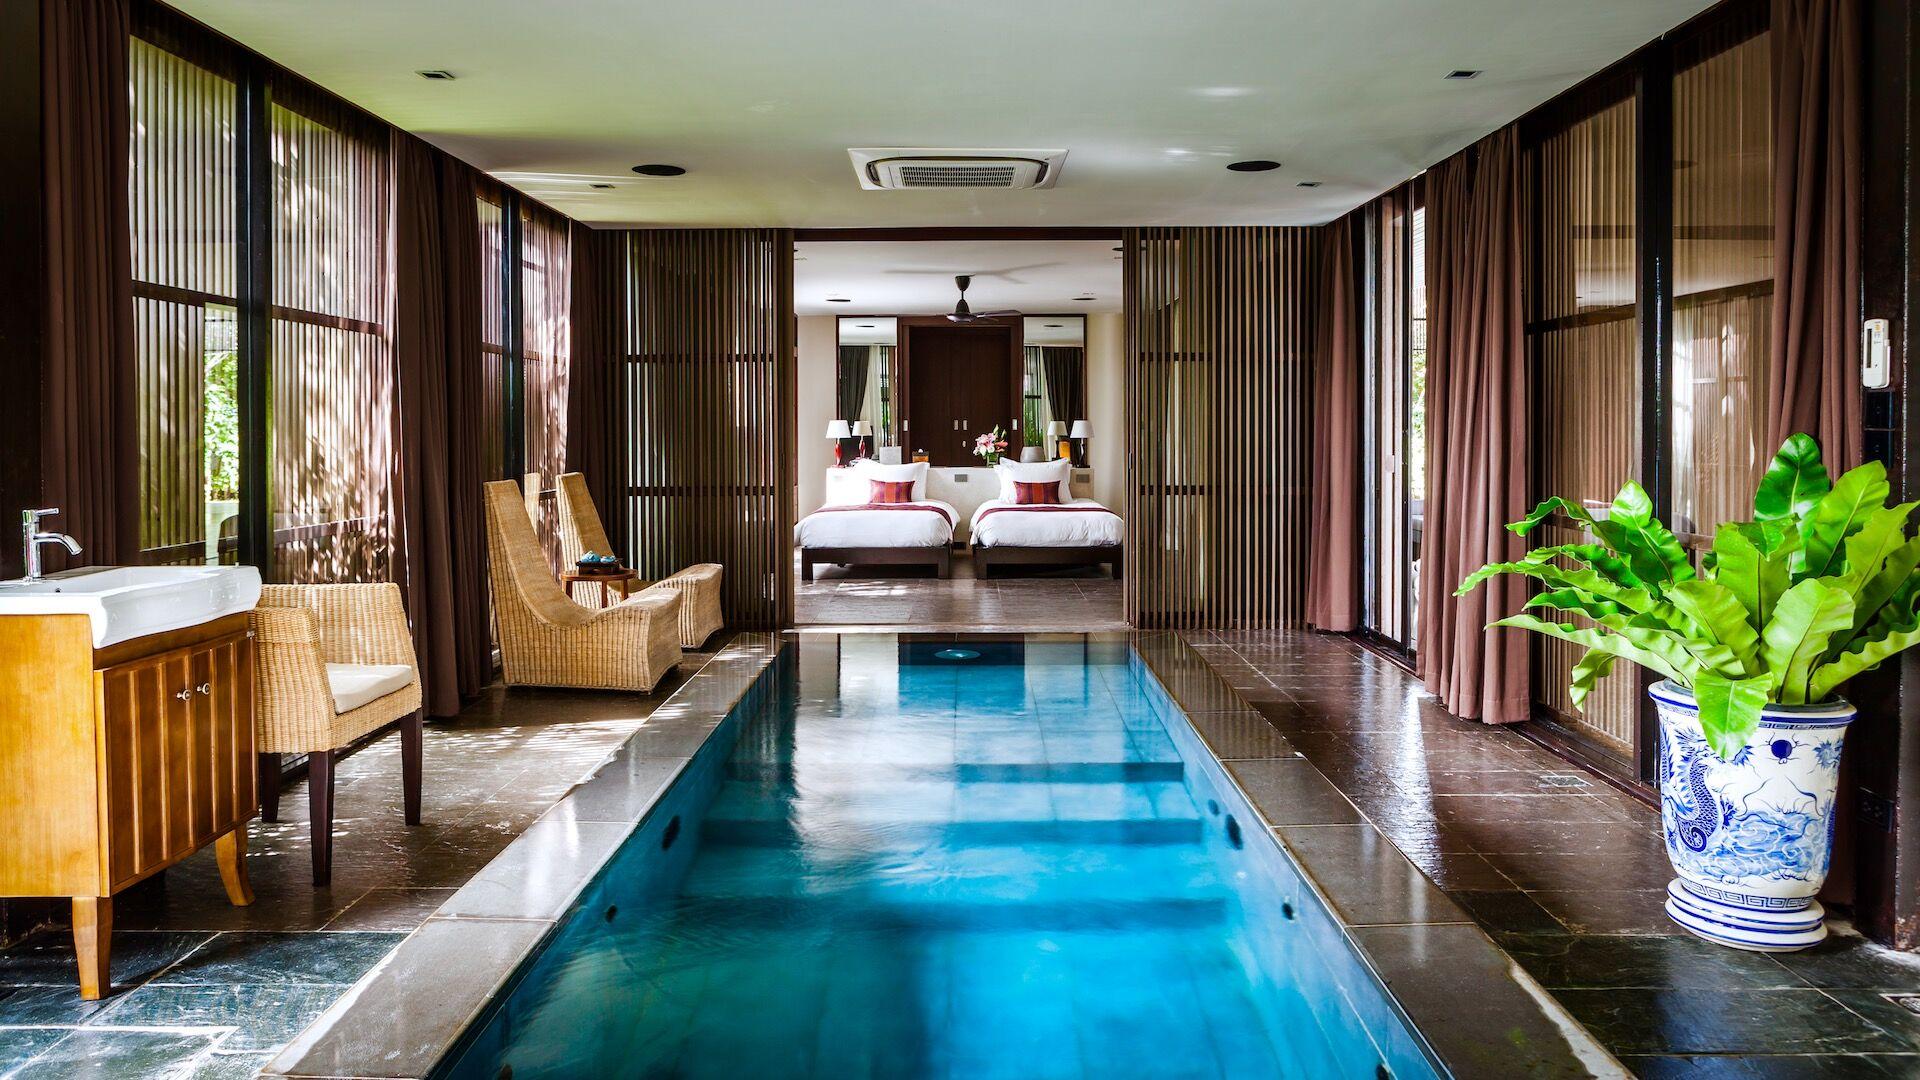 Villa Akatsuki: Koh Samui, Thailand